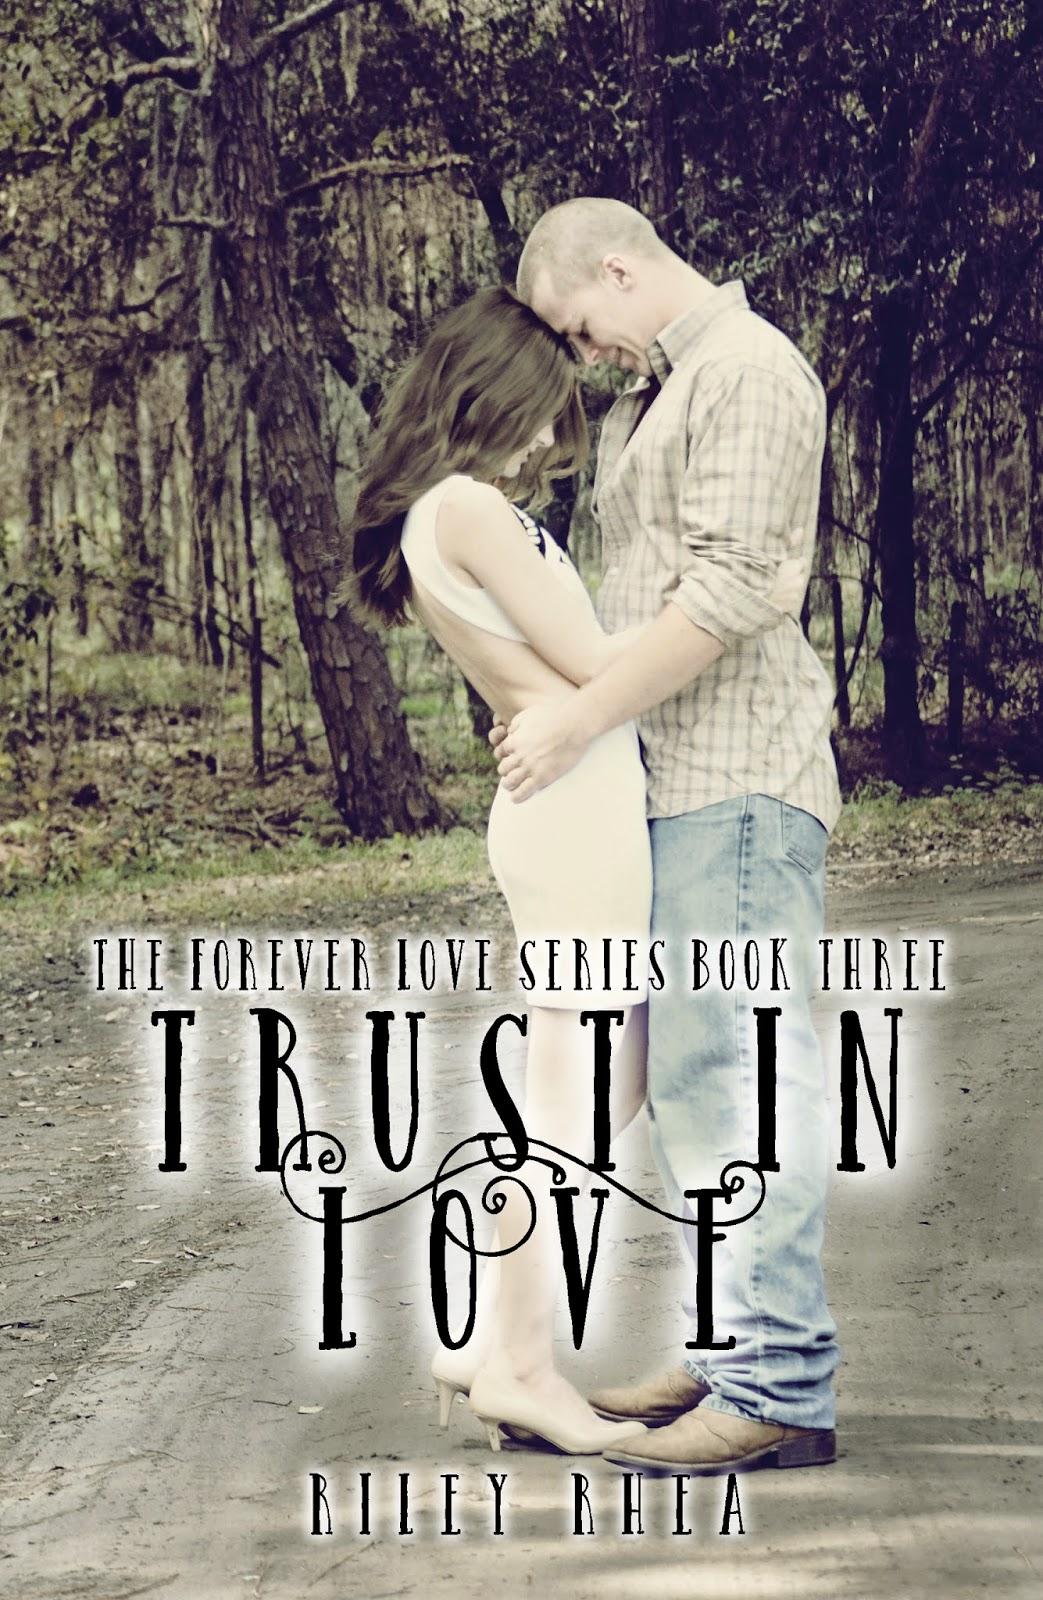 sma relationship trust series